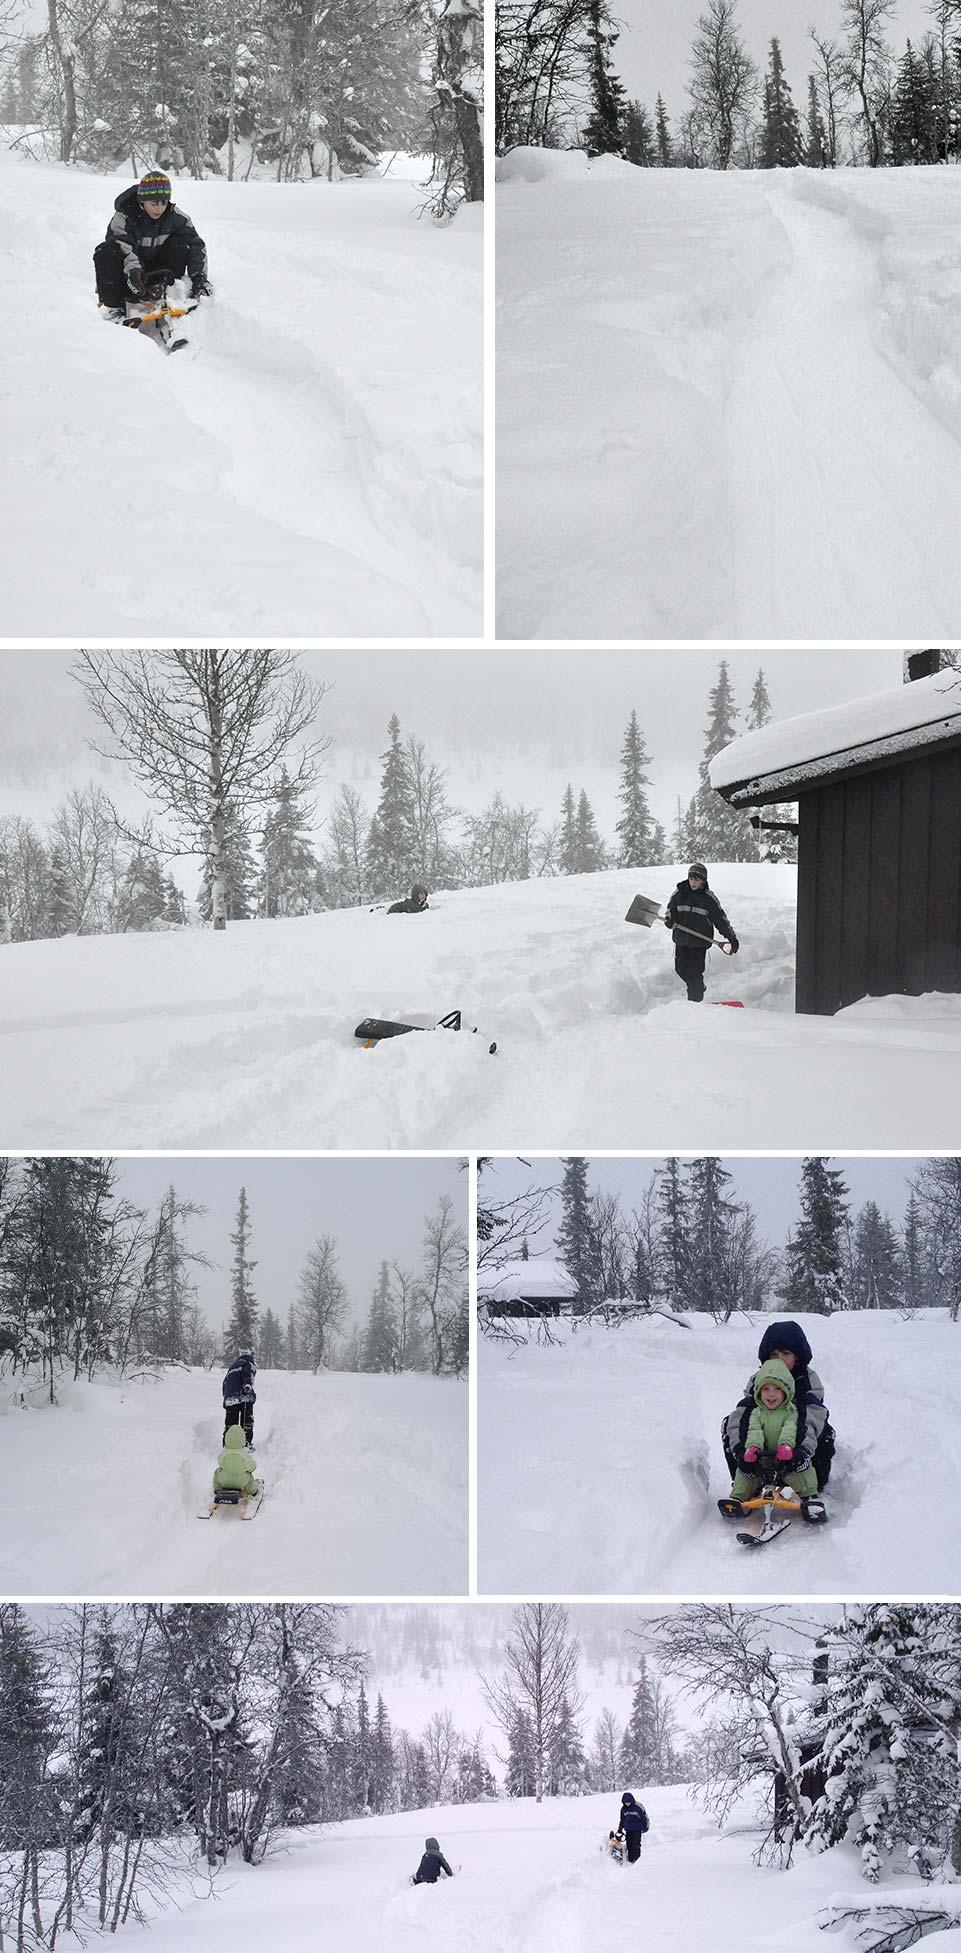 Ethan's sledding track